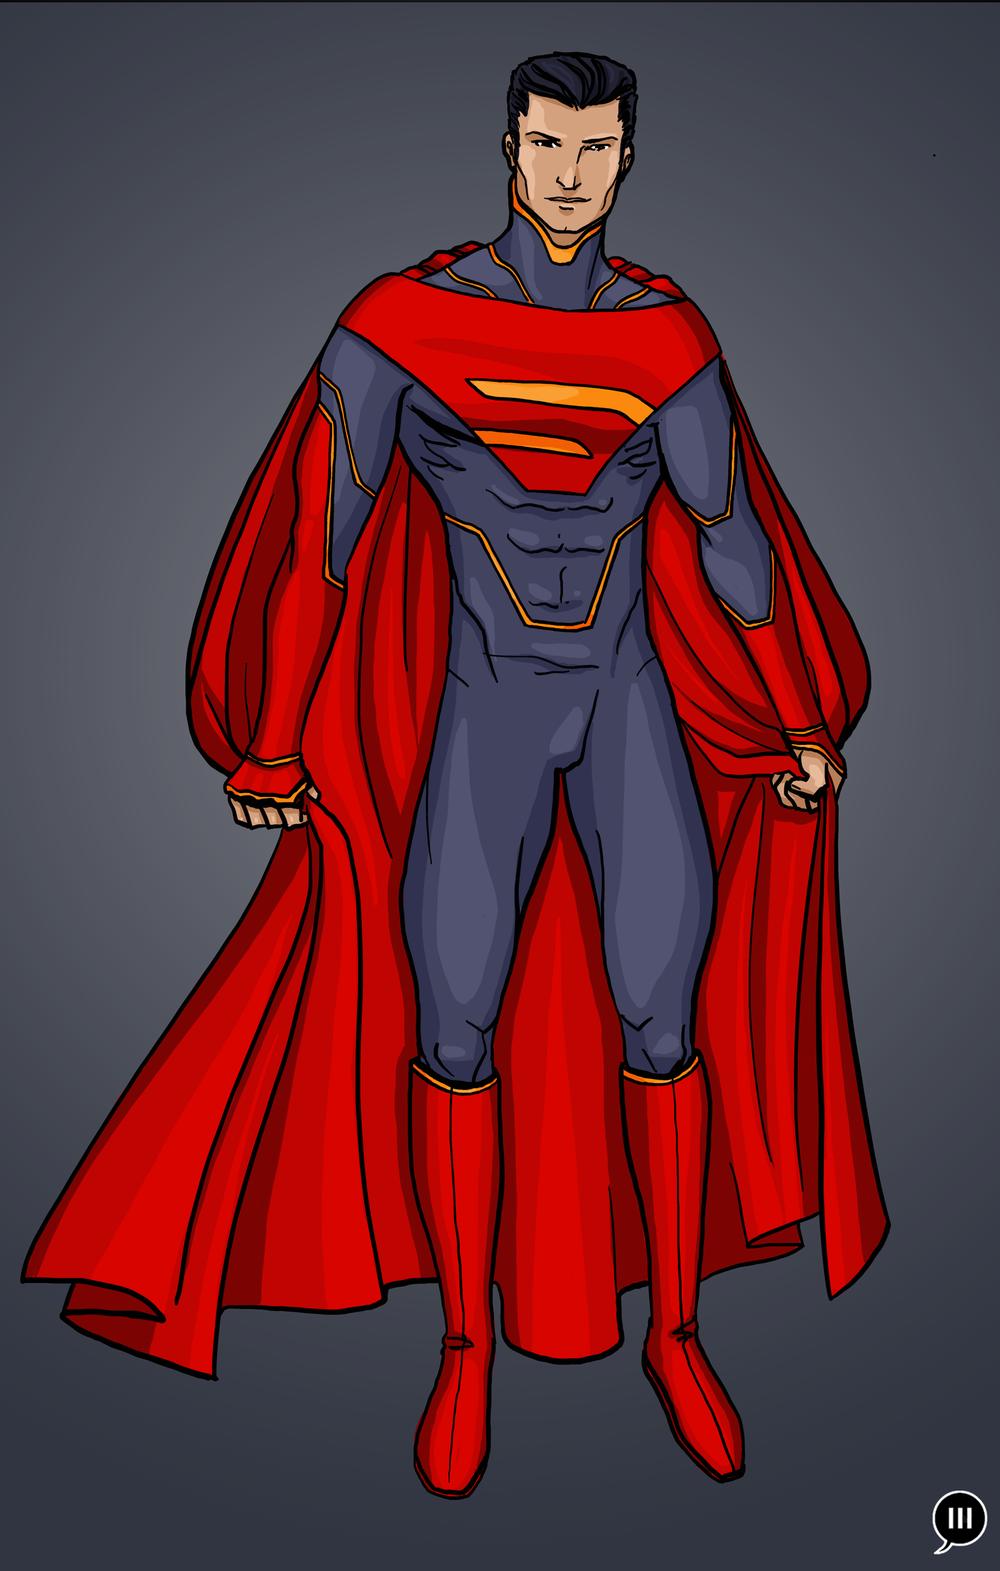 trdl1902_superman_mosrz.png